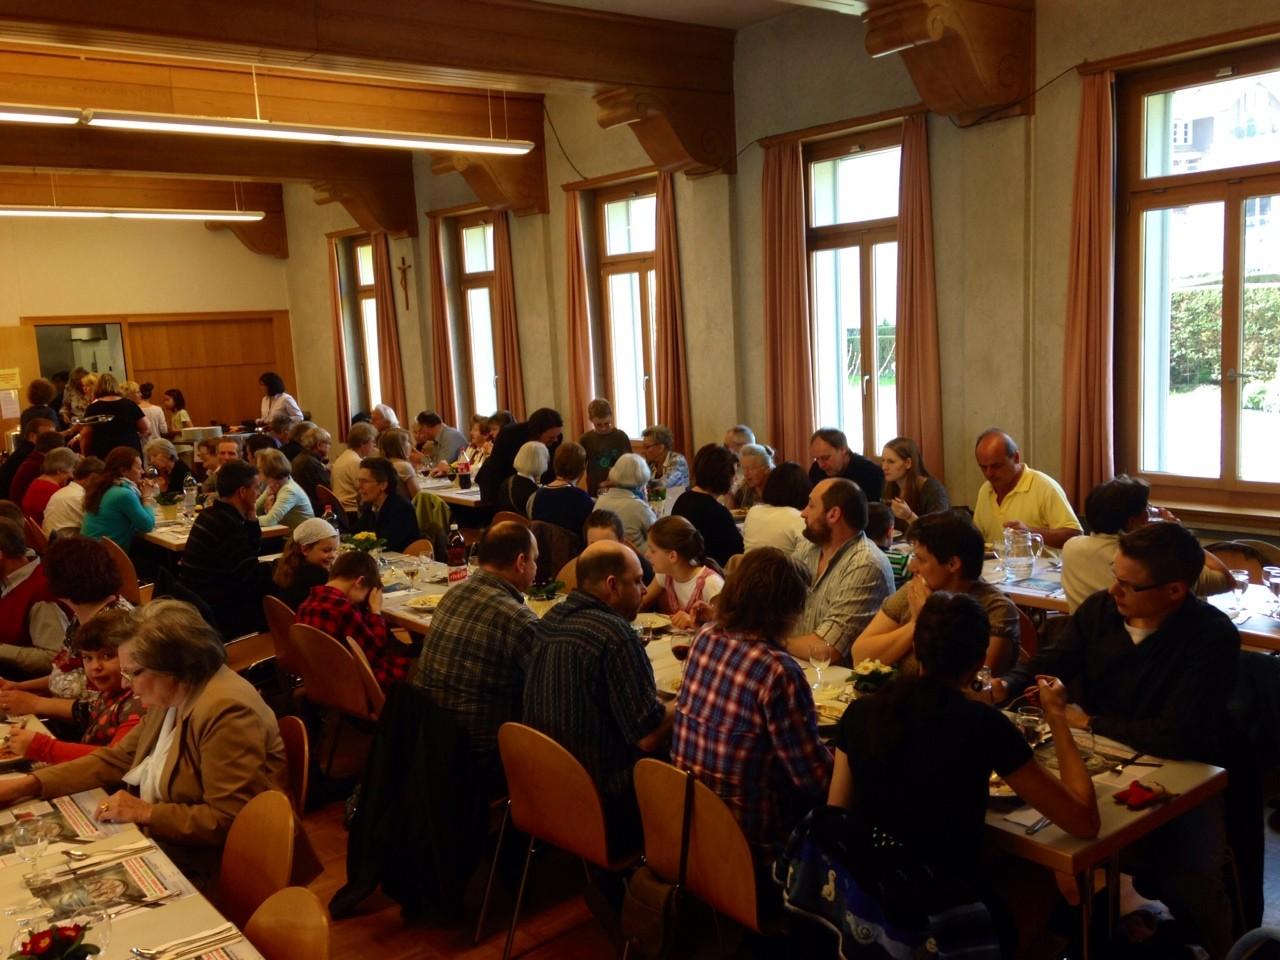 Spaghettitag ca. 130 Gäste